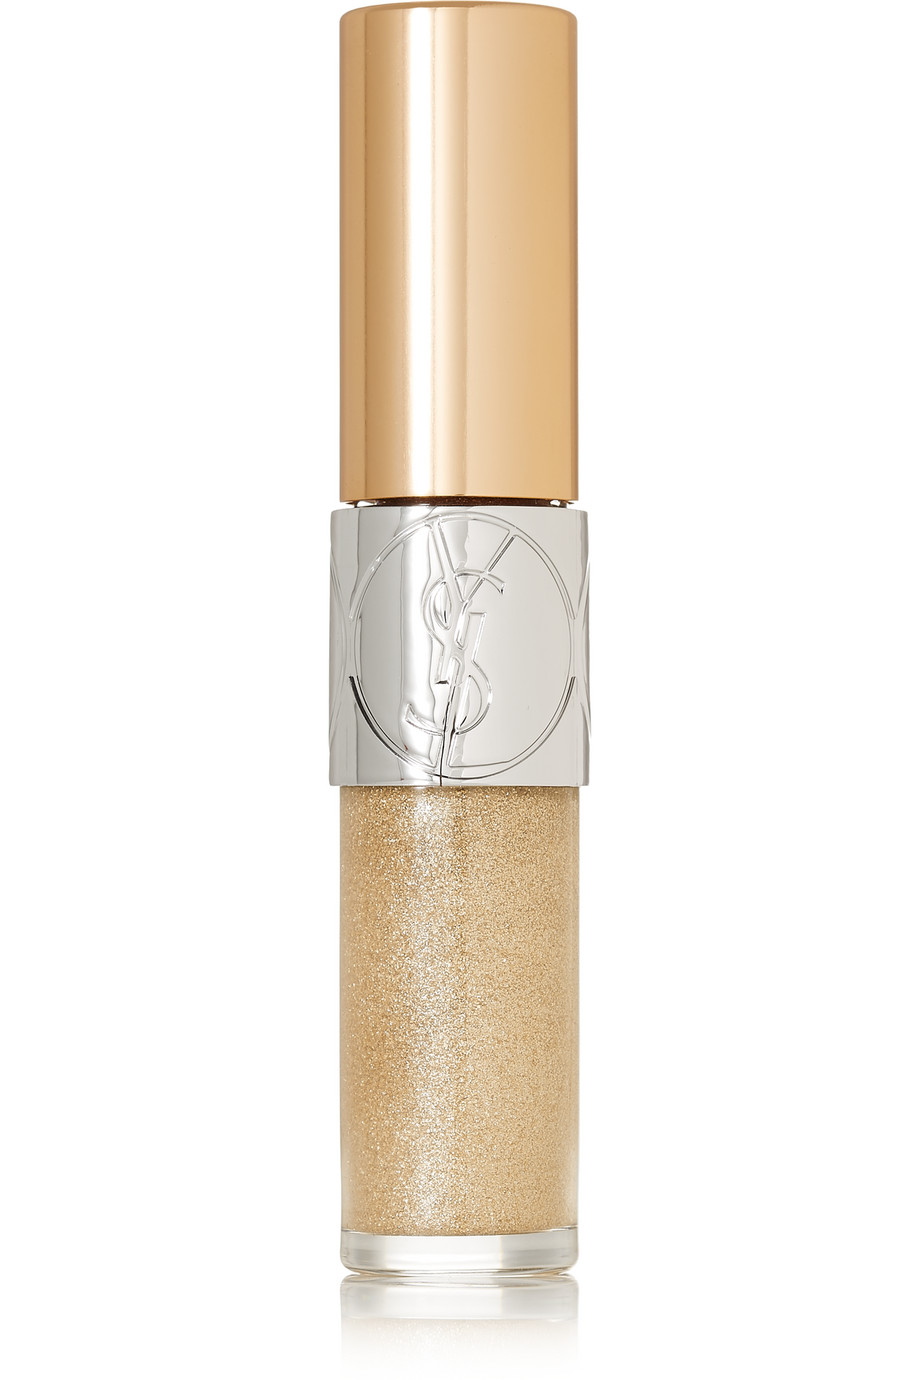 Full Metal Shadow - Dewy Gold 8, by Yves Saint Laurent Beauty